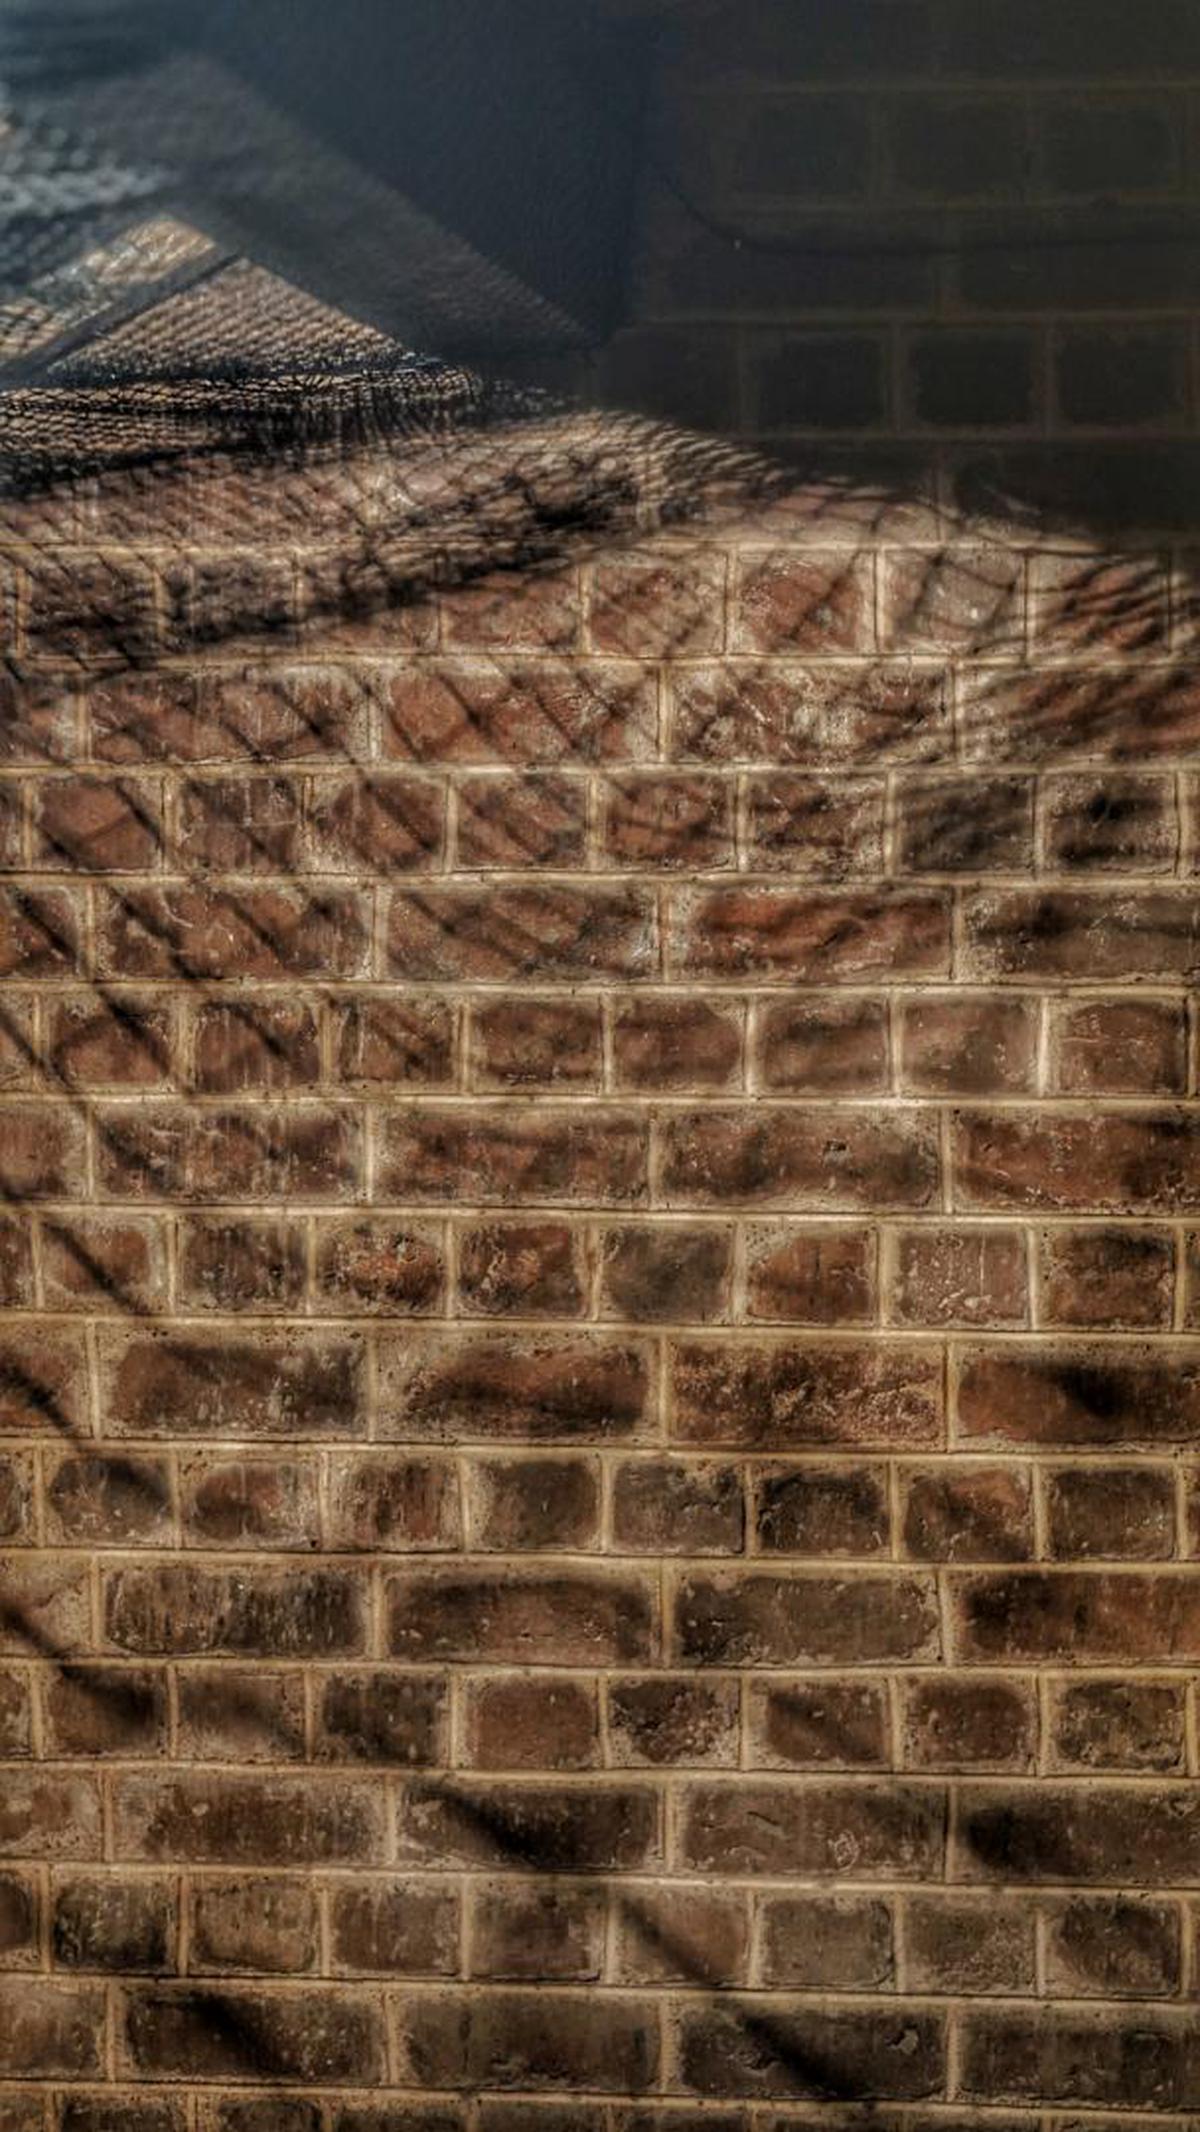 Image of Brickwork, Wall, Brick, Stone wall etc.